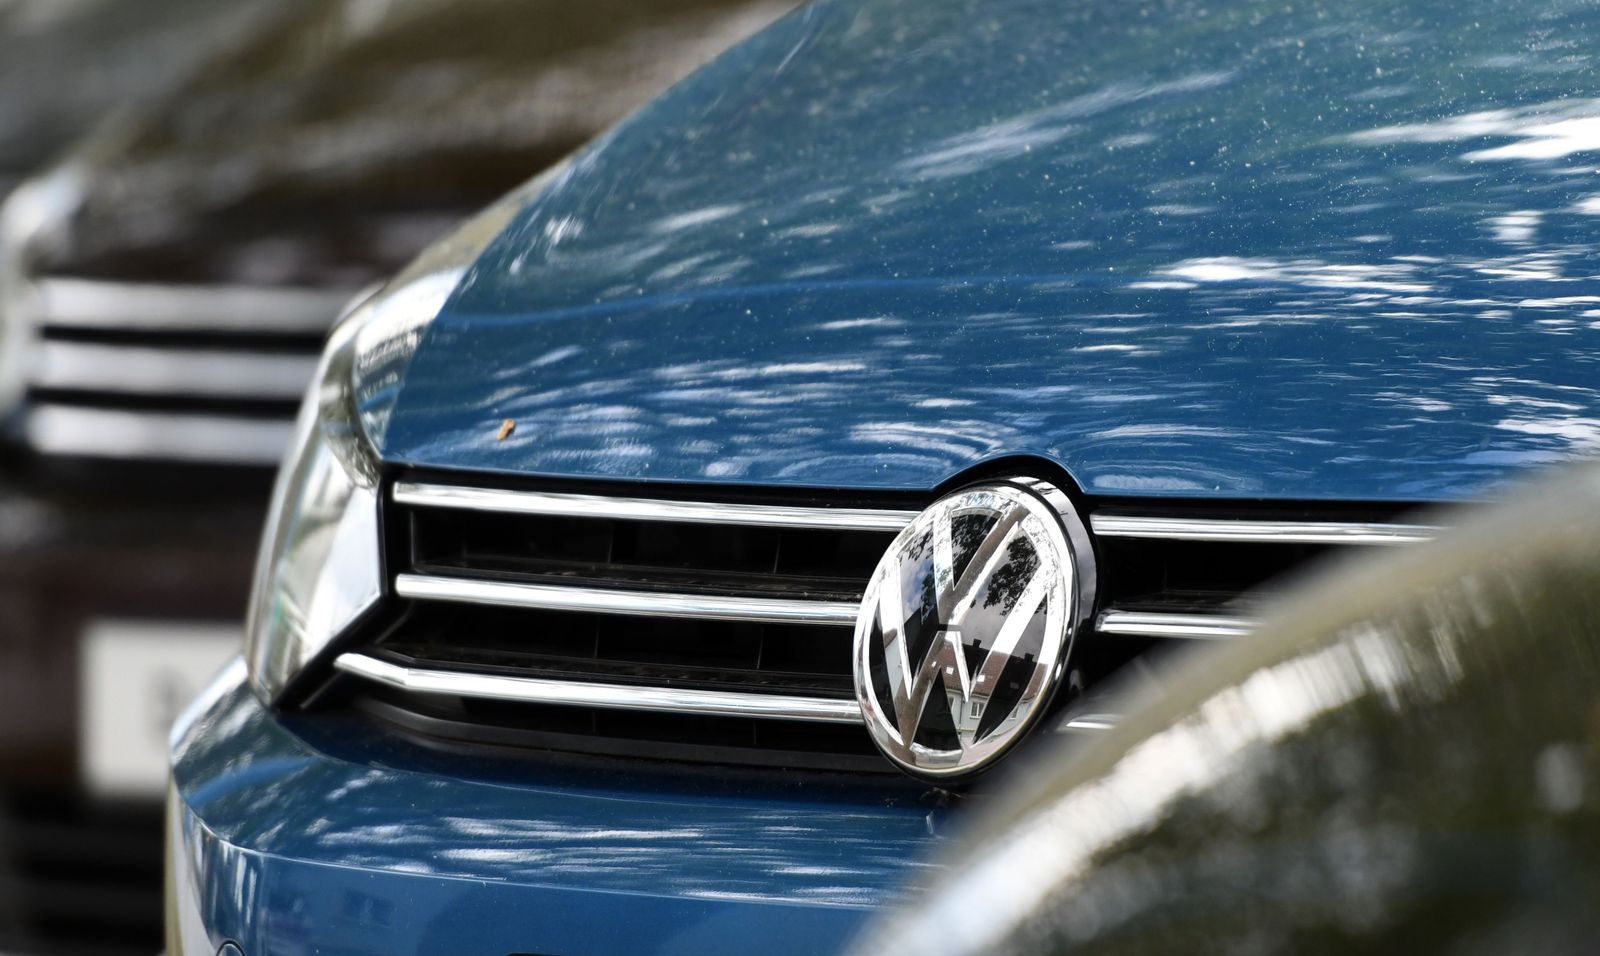 GERMANY-AUTOMOBILE-POLLUTION-CONSUMER-TRIAL-VOLKSWGEN